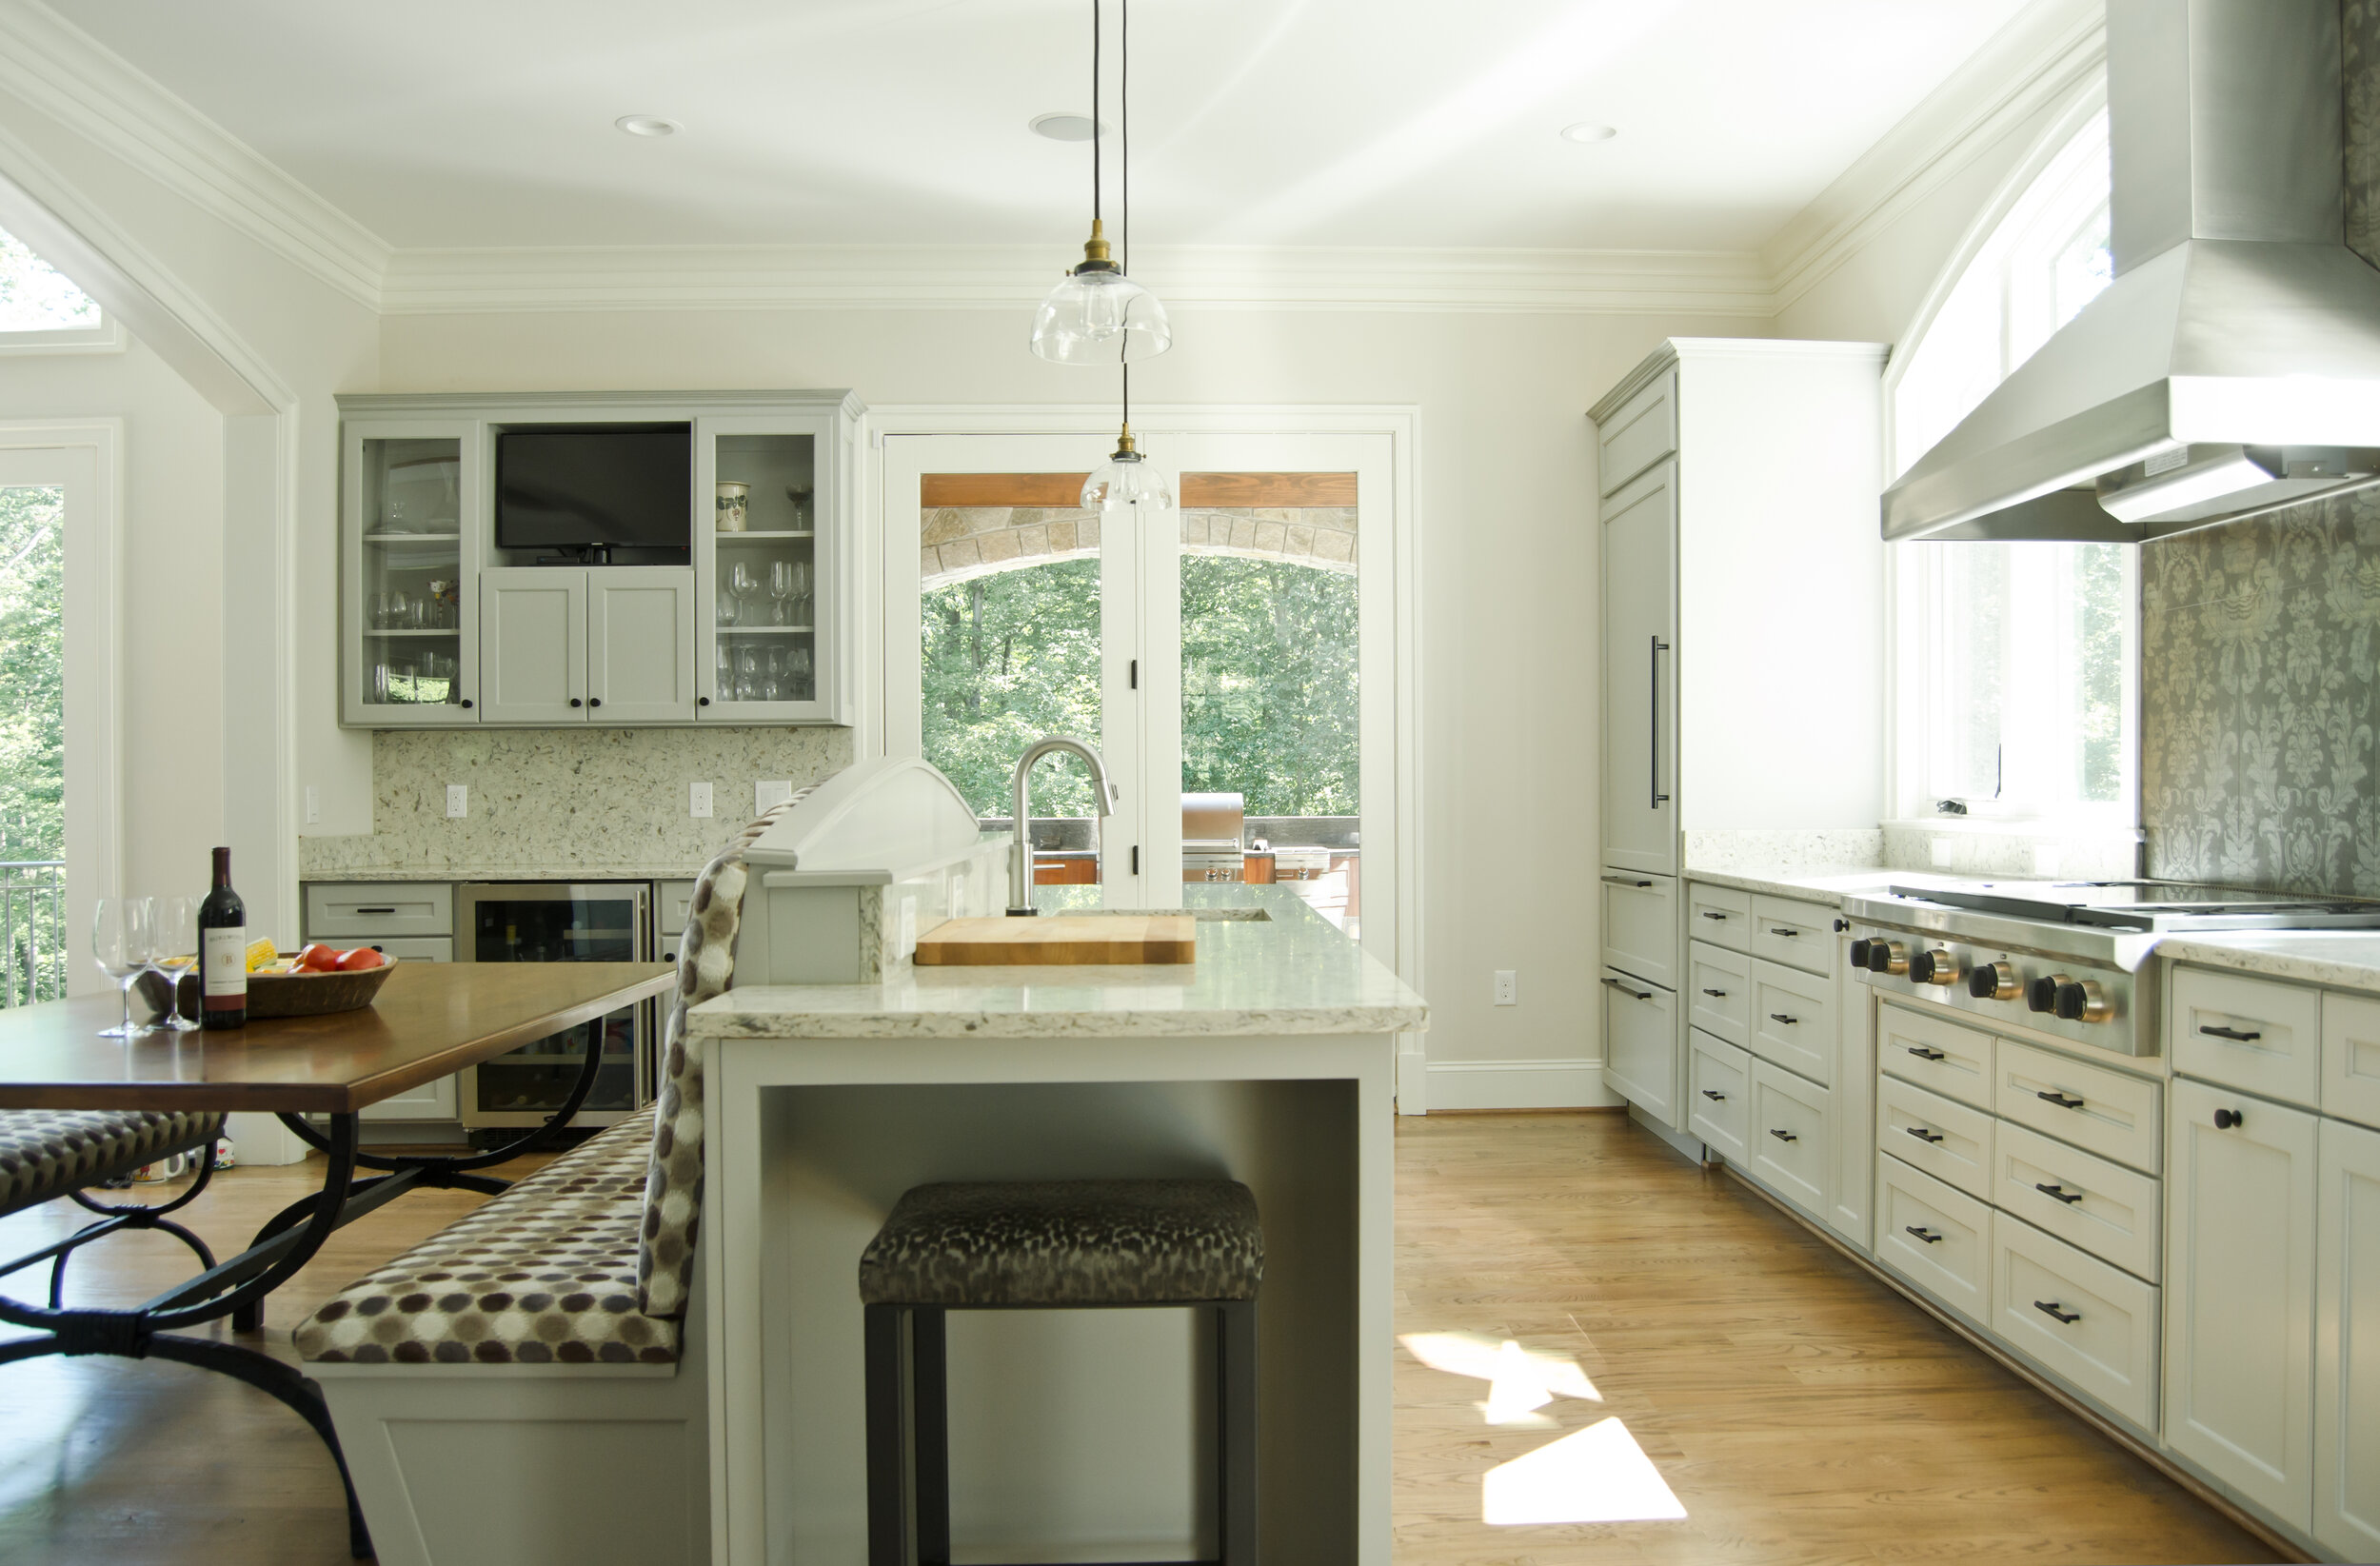 Kerry_Beth_Photo_Courtney_Ludeman_Interiors_Richmond_Interior_Designer_General_Contractor-19.jpg